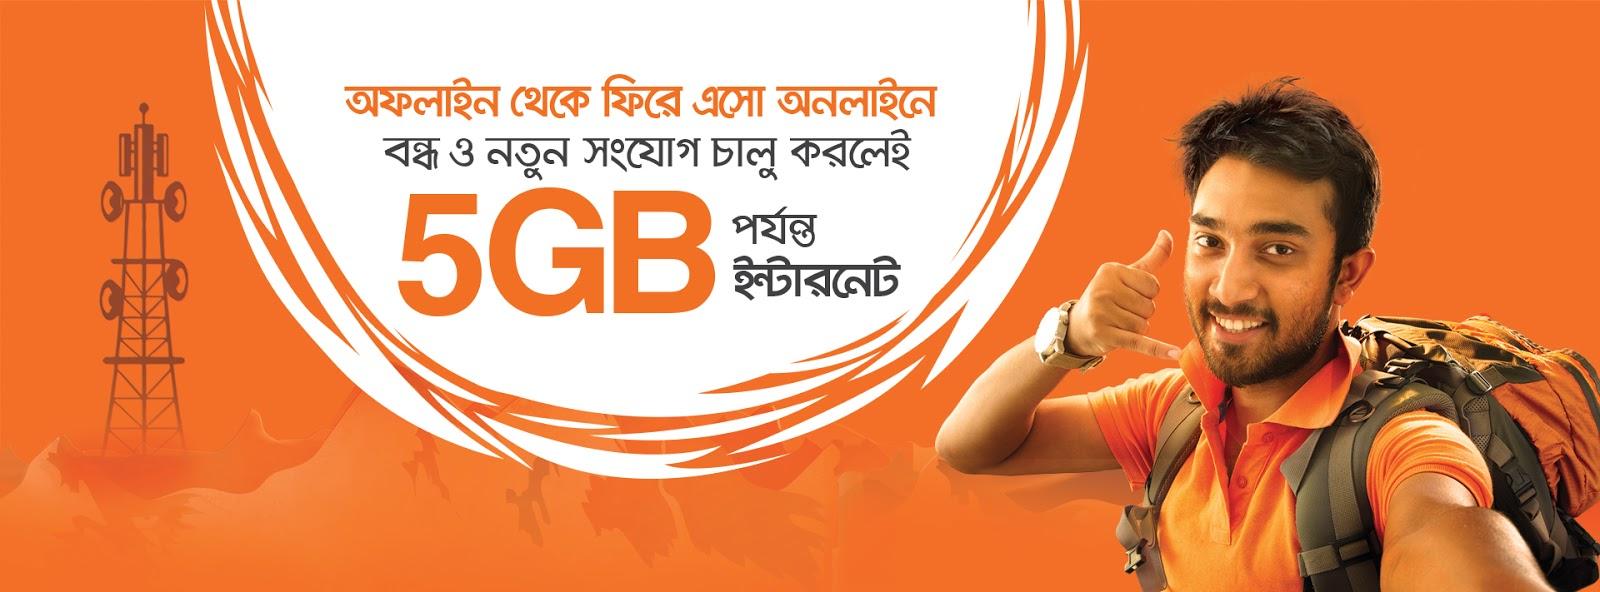 Ashna Habib Bhabna Bangladeshi model photos & Biography